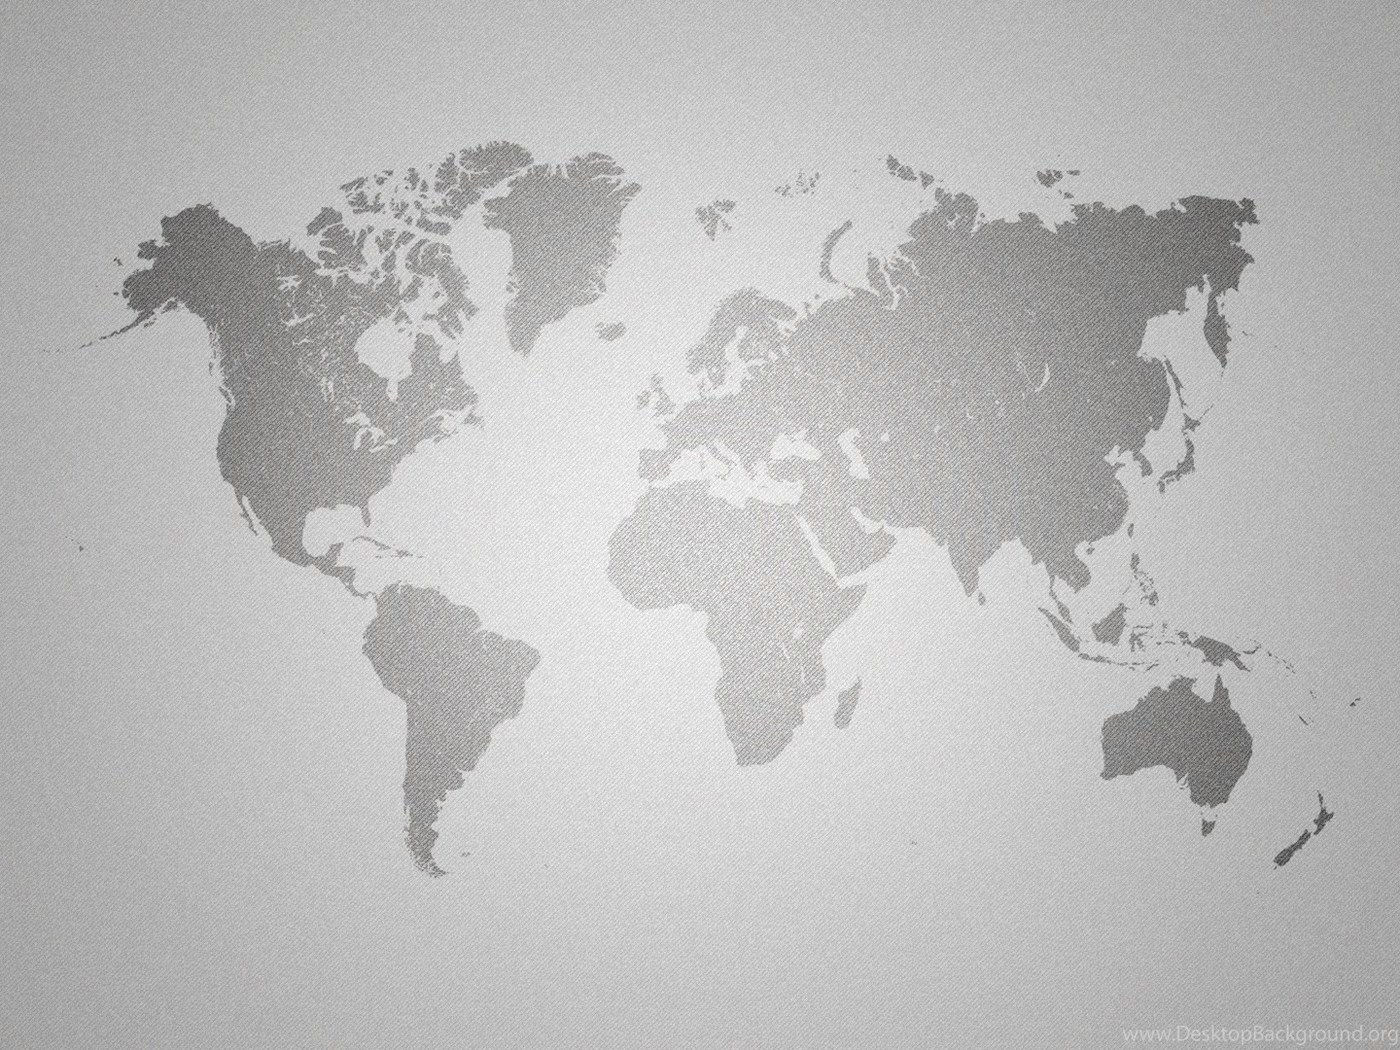 High resolution world map background hd siwallpaperhd 23580 desktop fullscreen gumiabroncs Image collections